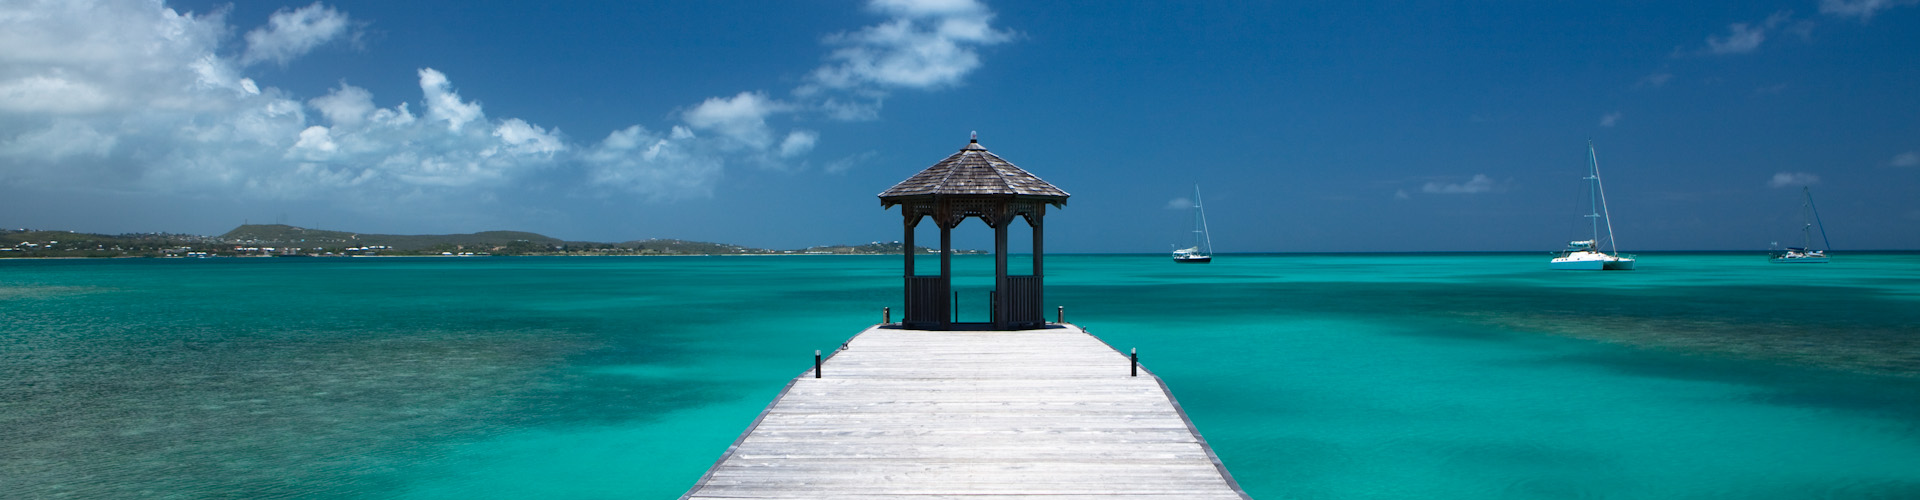 Jumby Bay Resort in Antigua